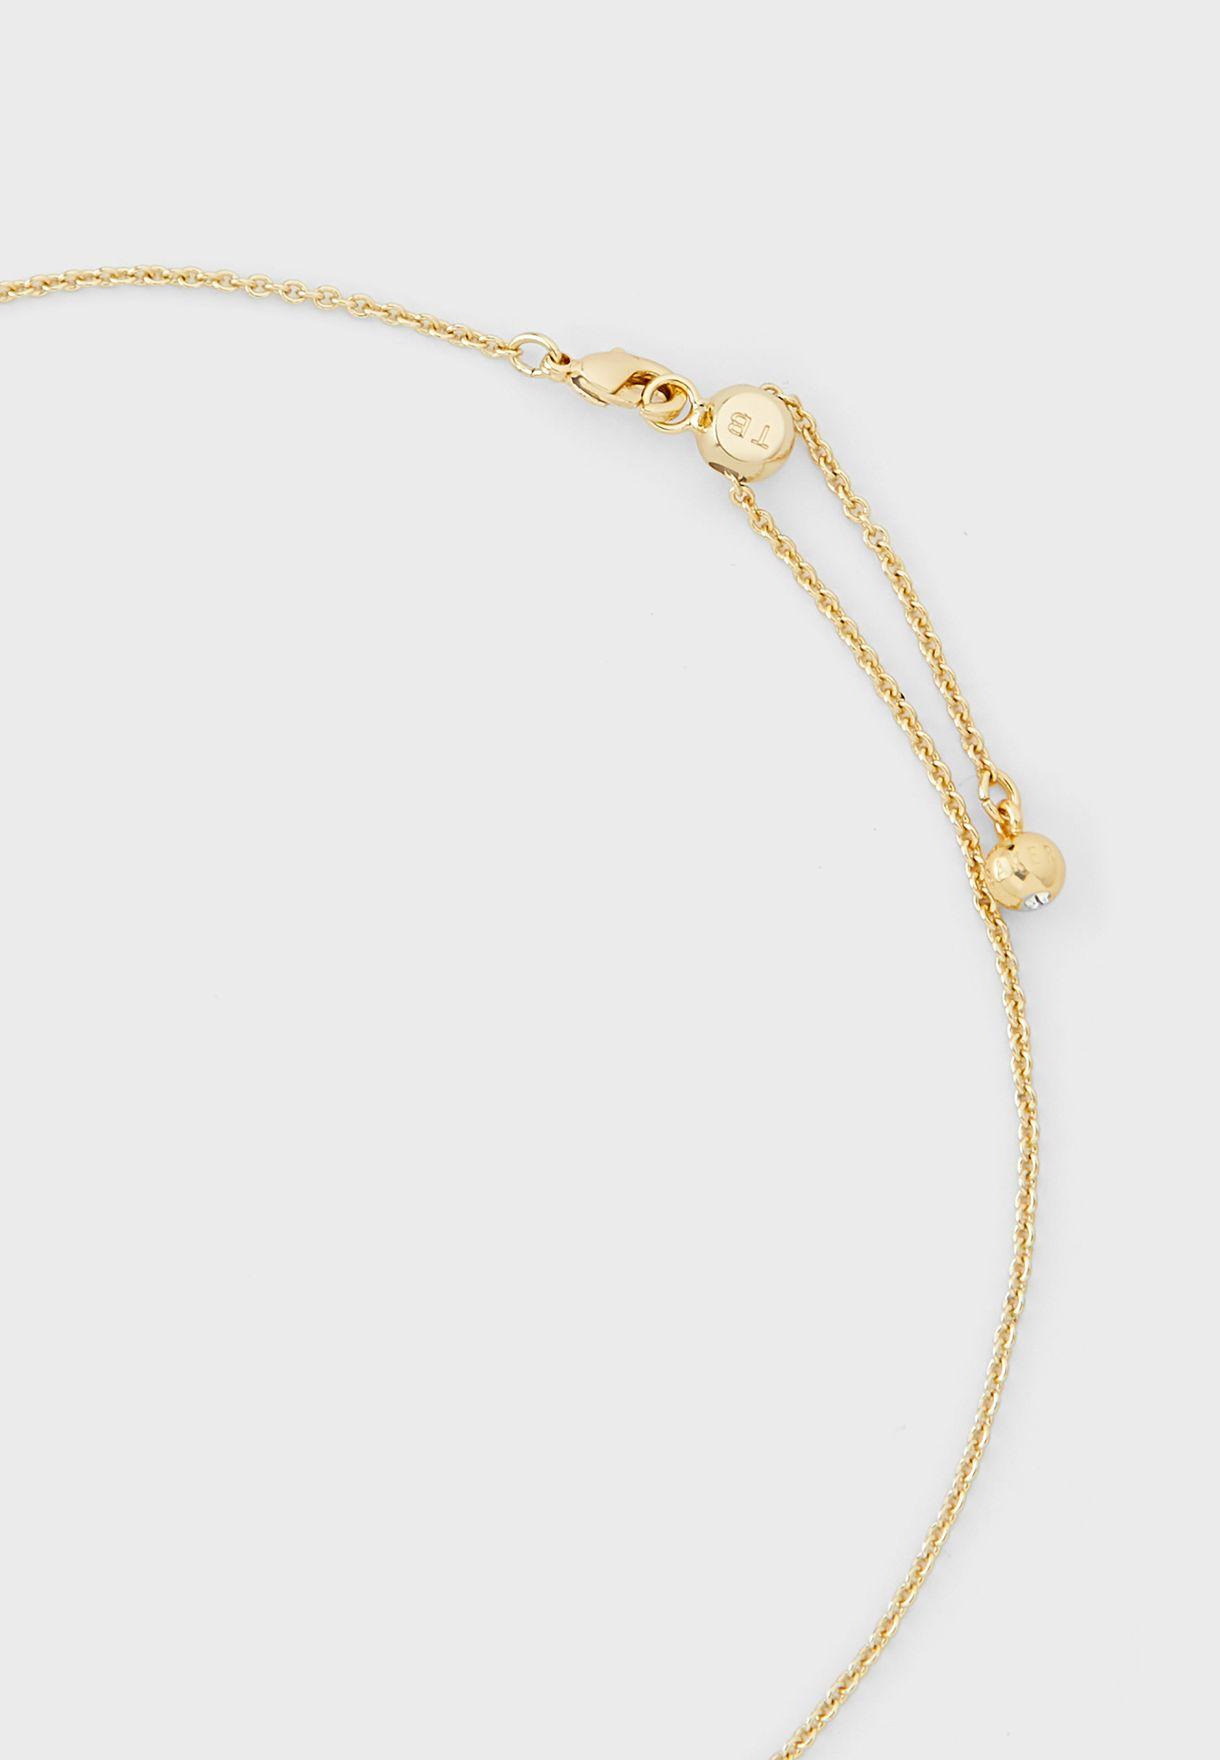 Mesra Moonrock Penadant Necklace